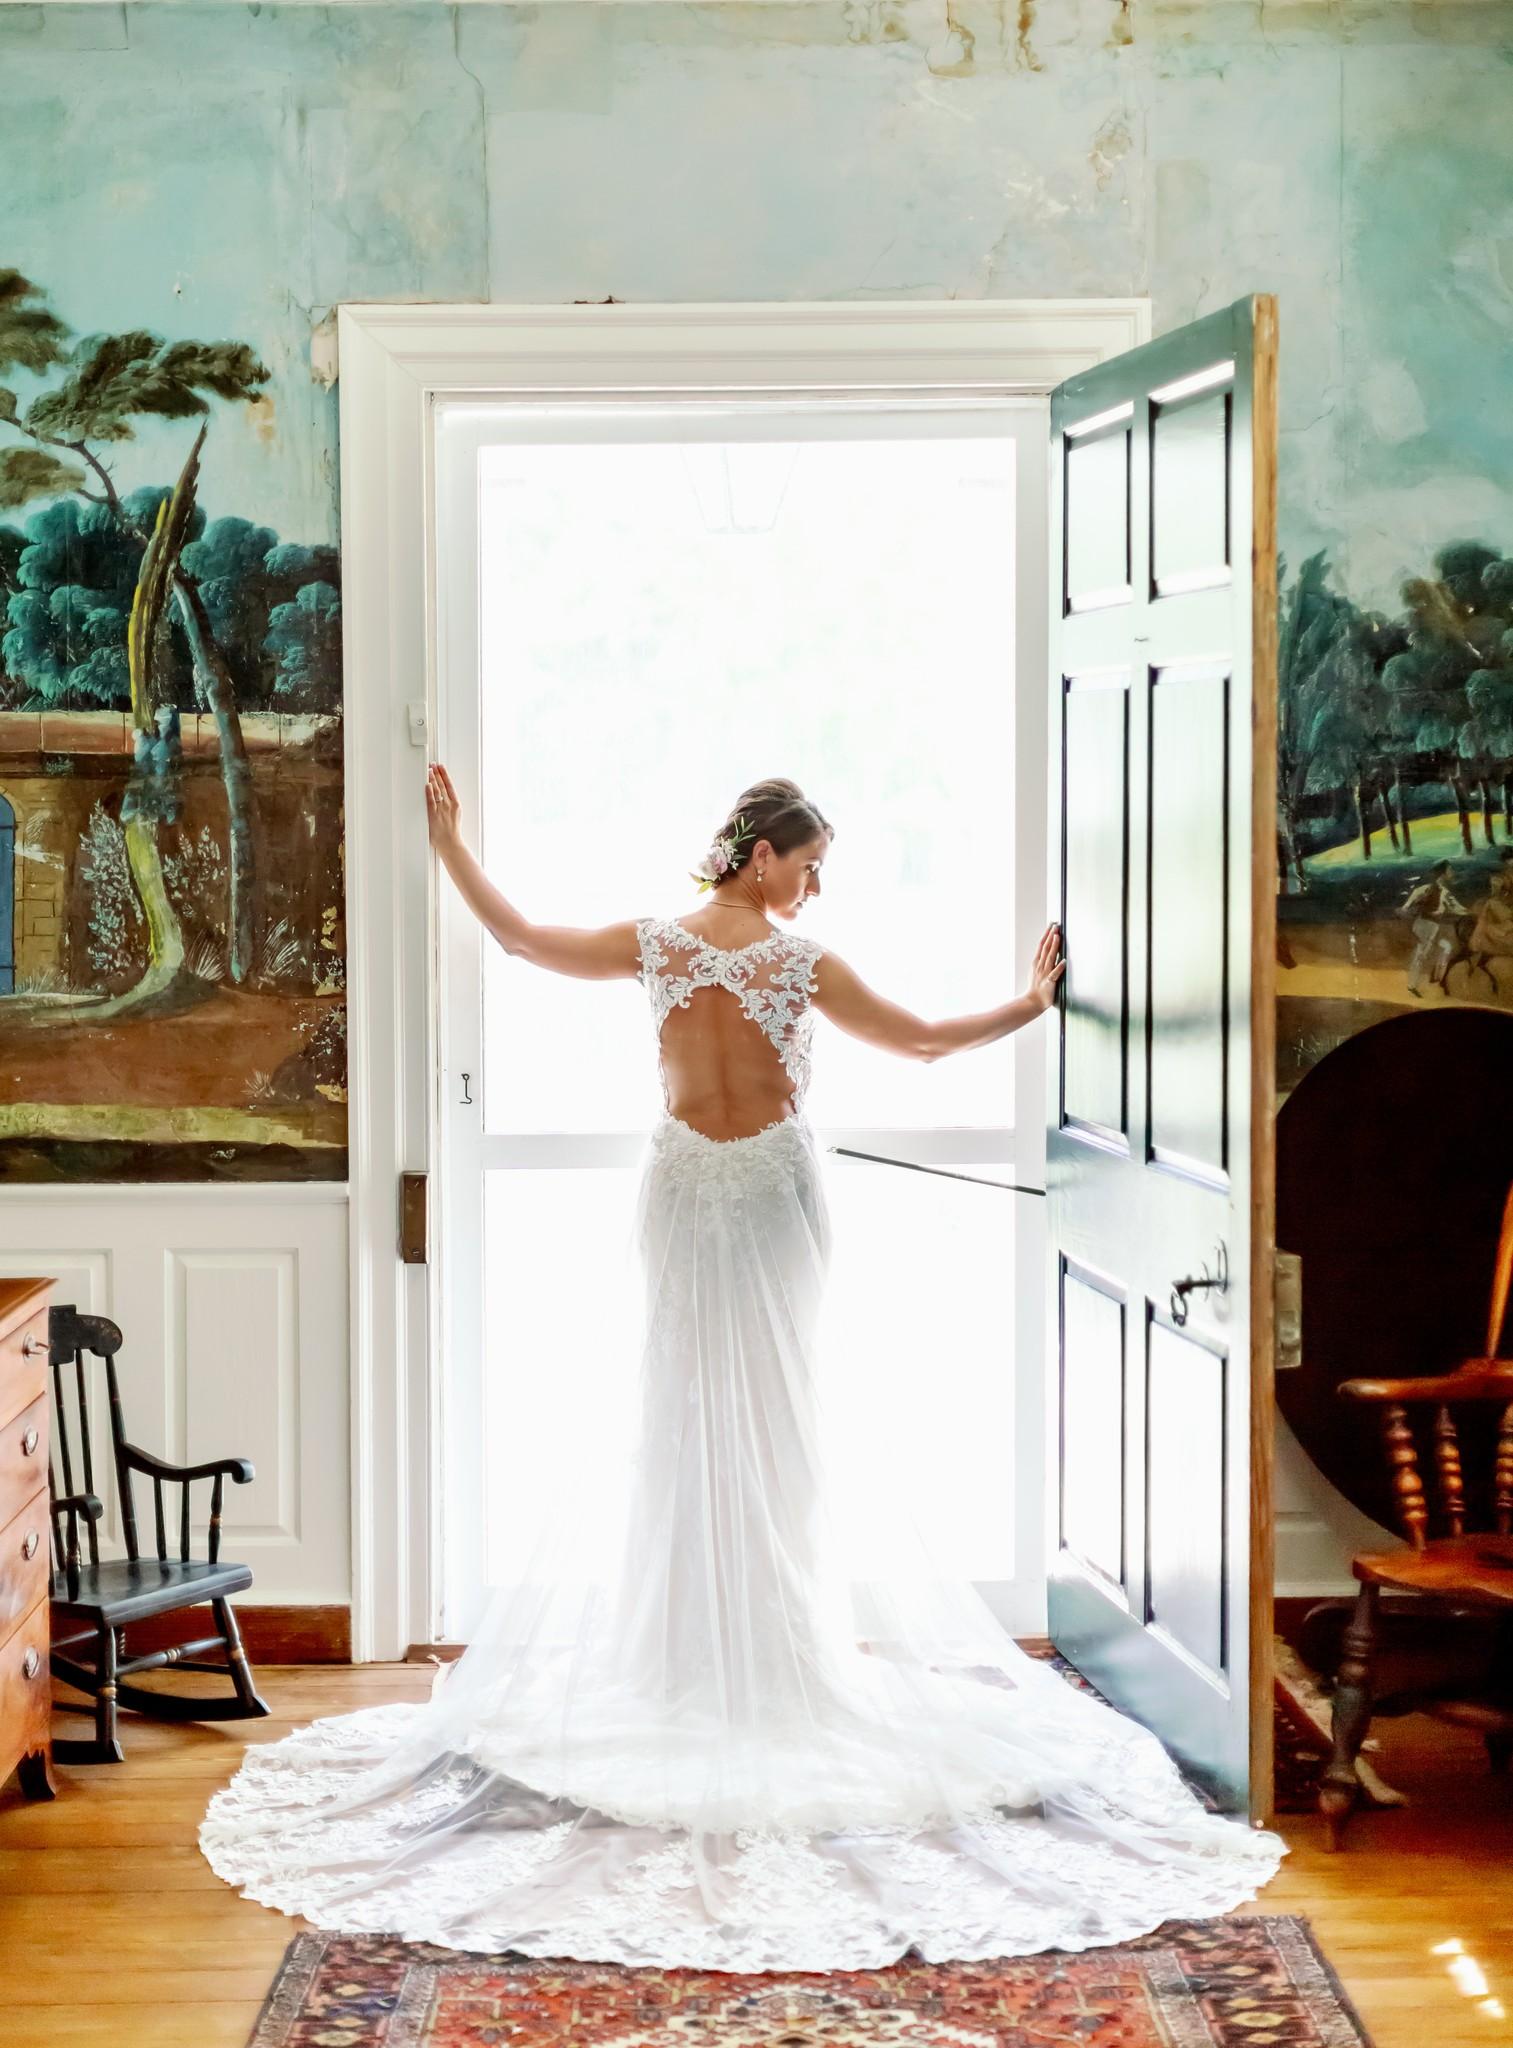 Cape-Charles- Wedding- Erik-Haven-2019 (80).jpg